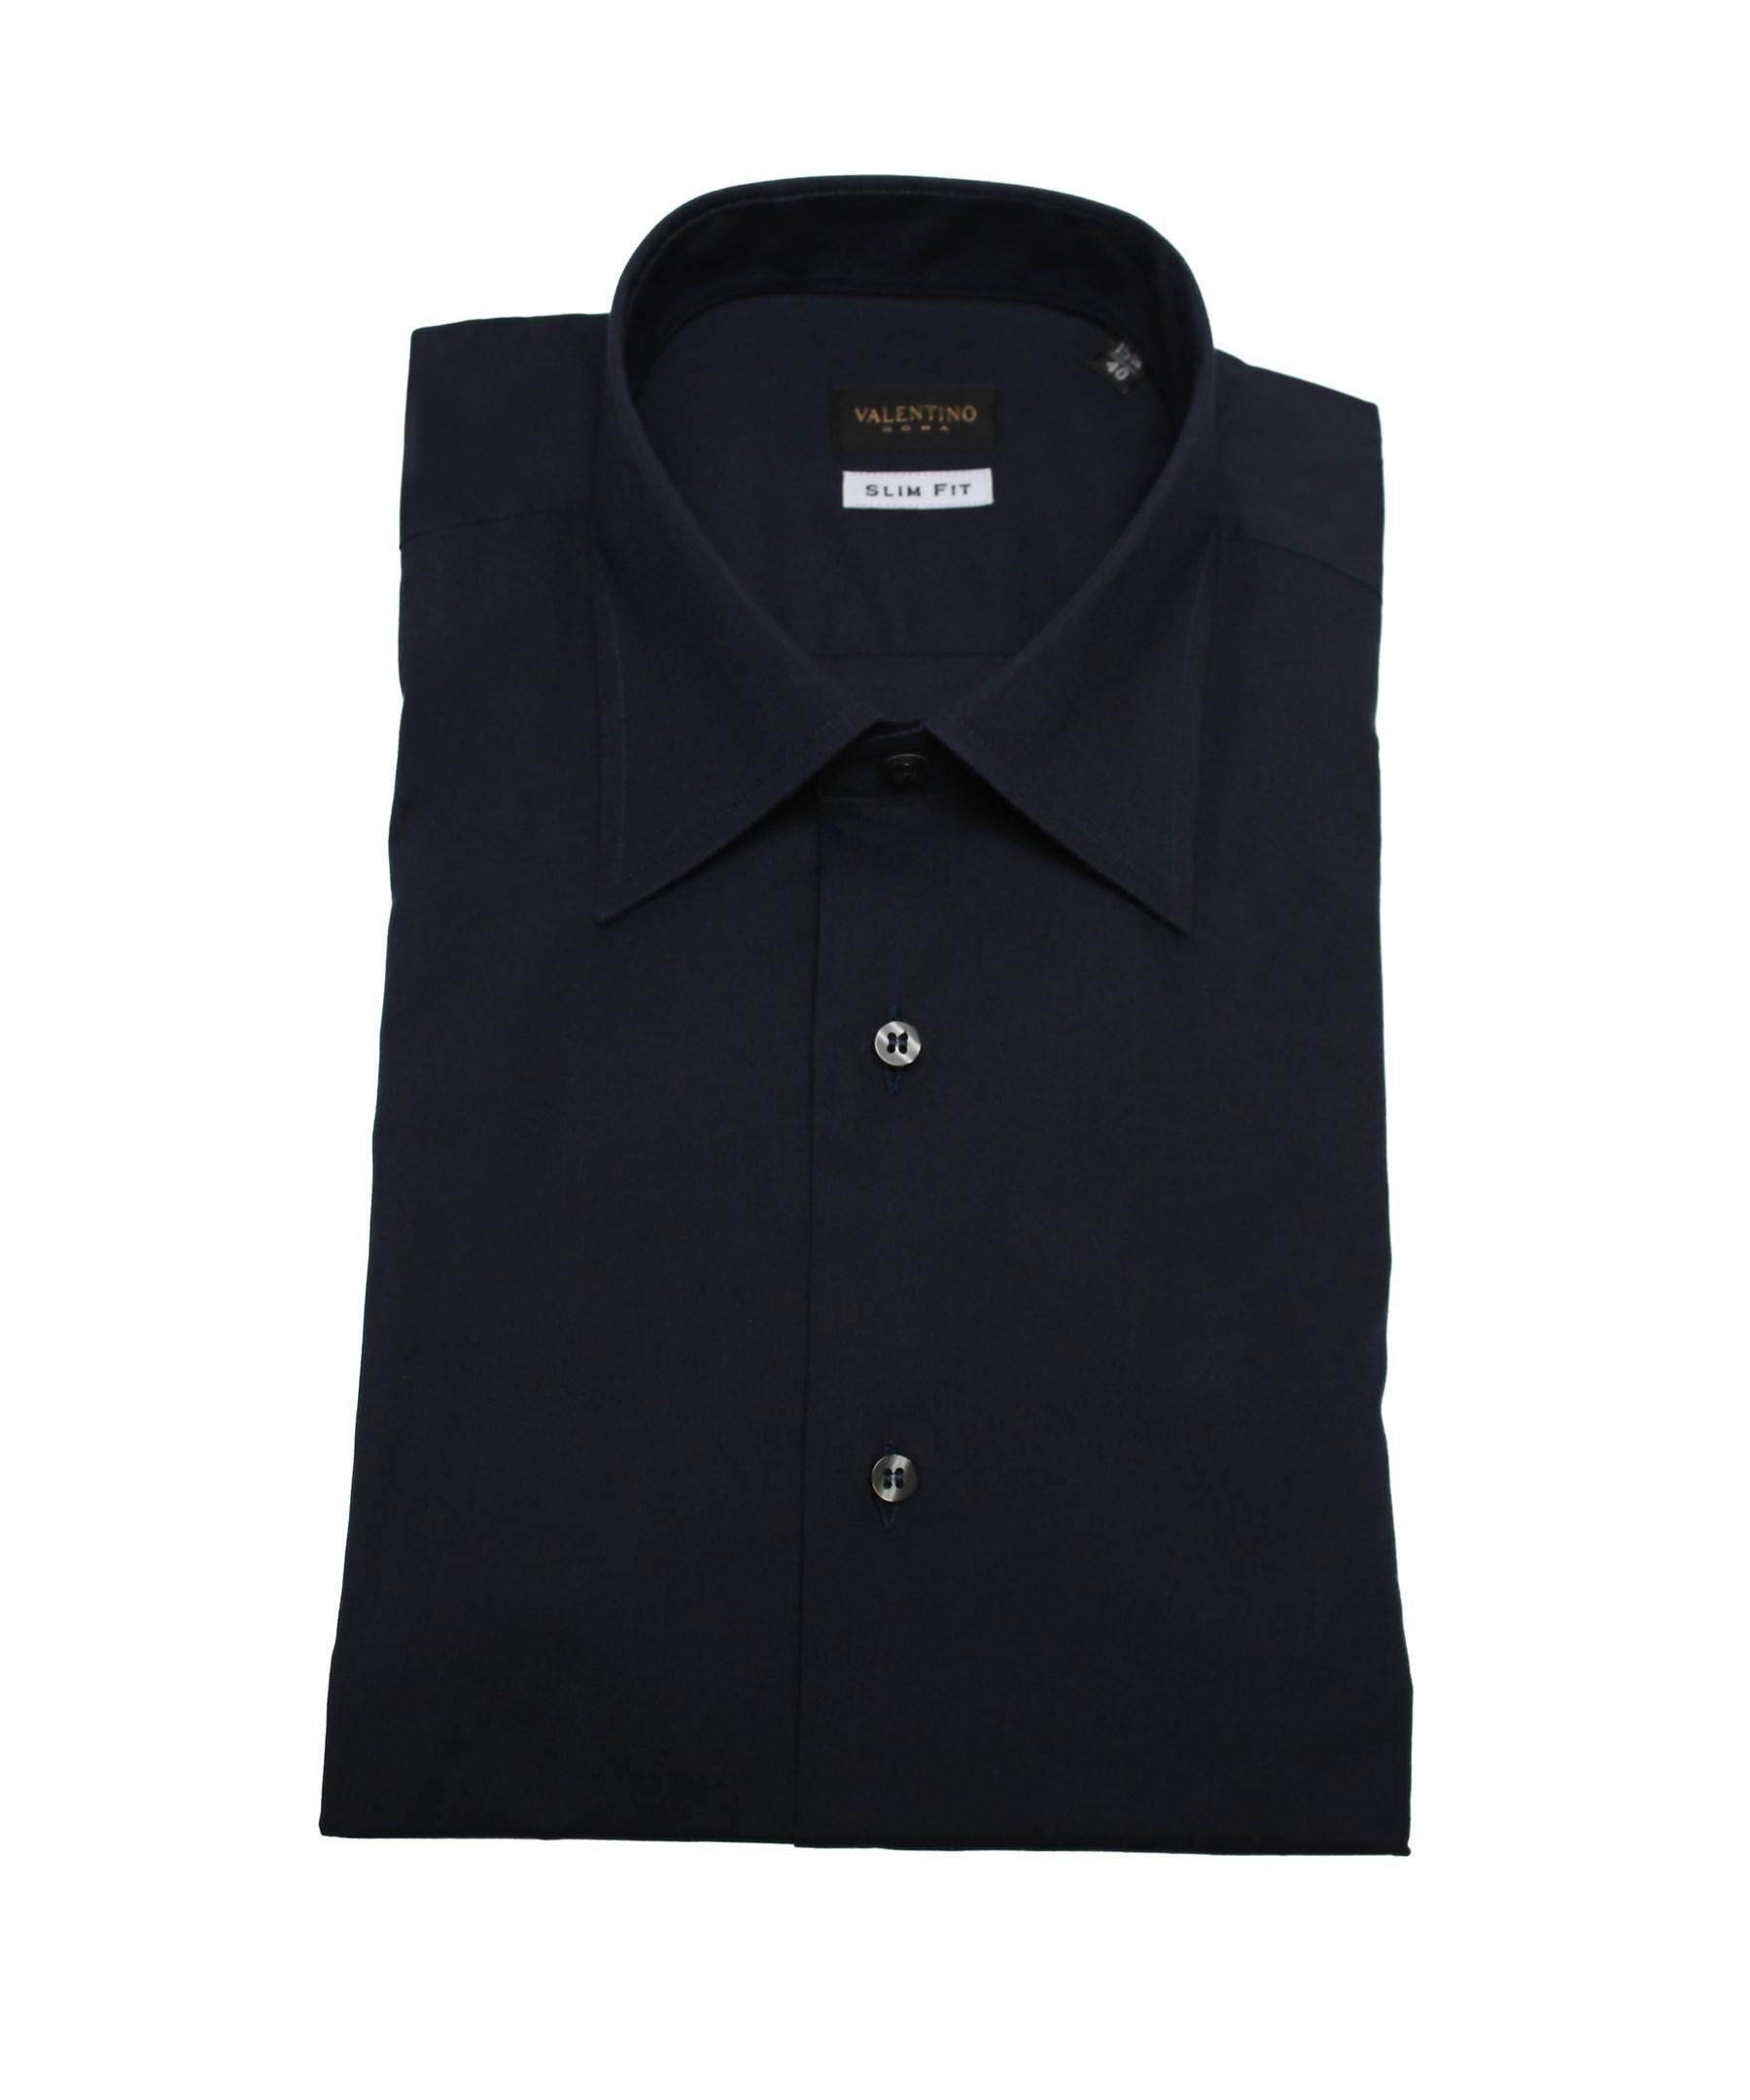 Valentino men slim fit cotton dress shirt black in black for Boys slim fit dress shirt